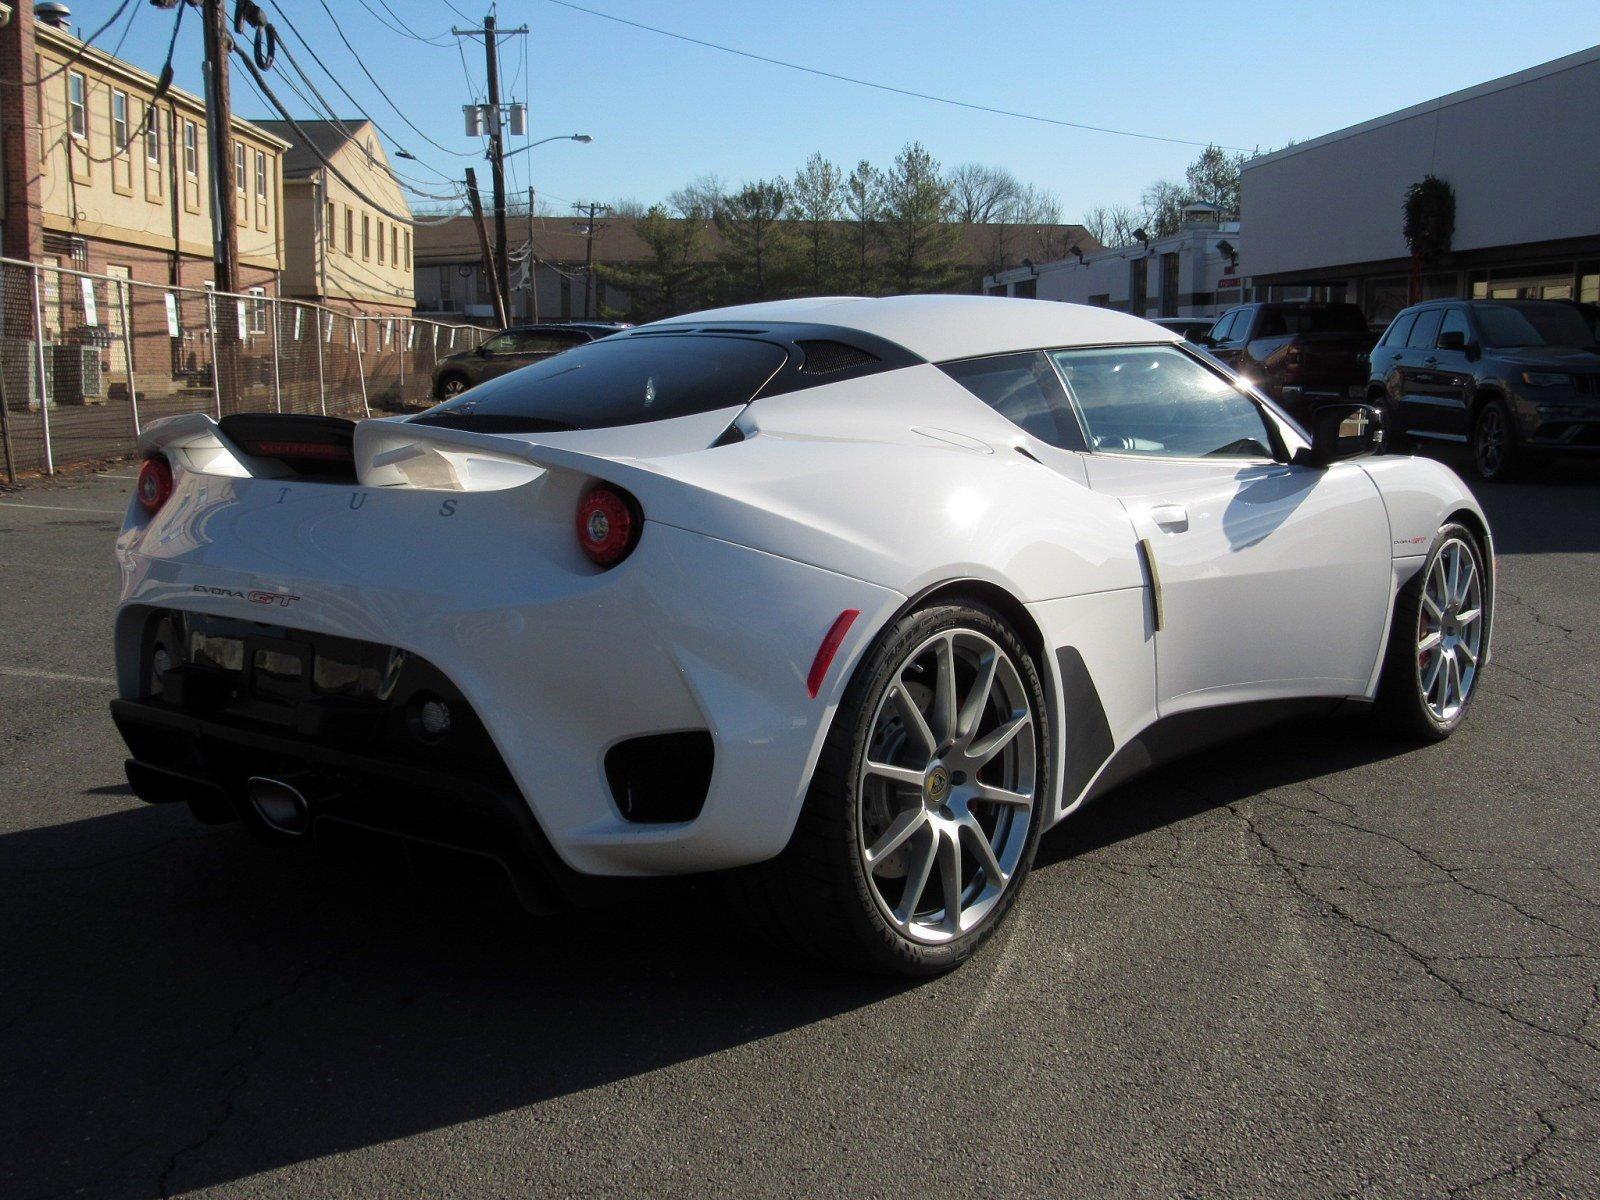 New 2020 Lotus Evora GT For Sale ($99,895) | Victory Lotus ...